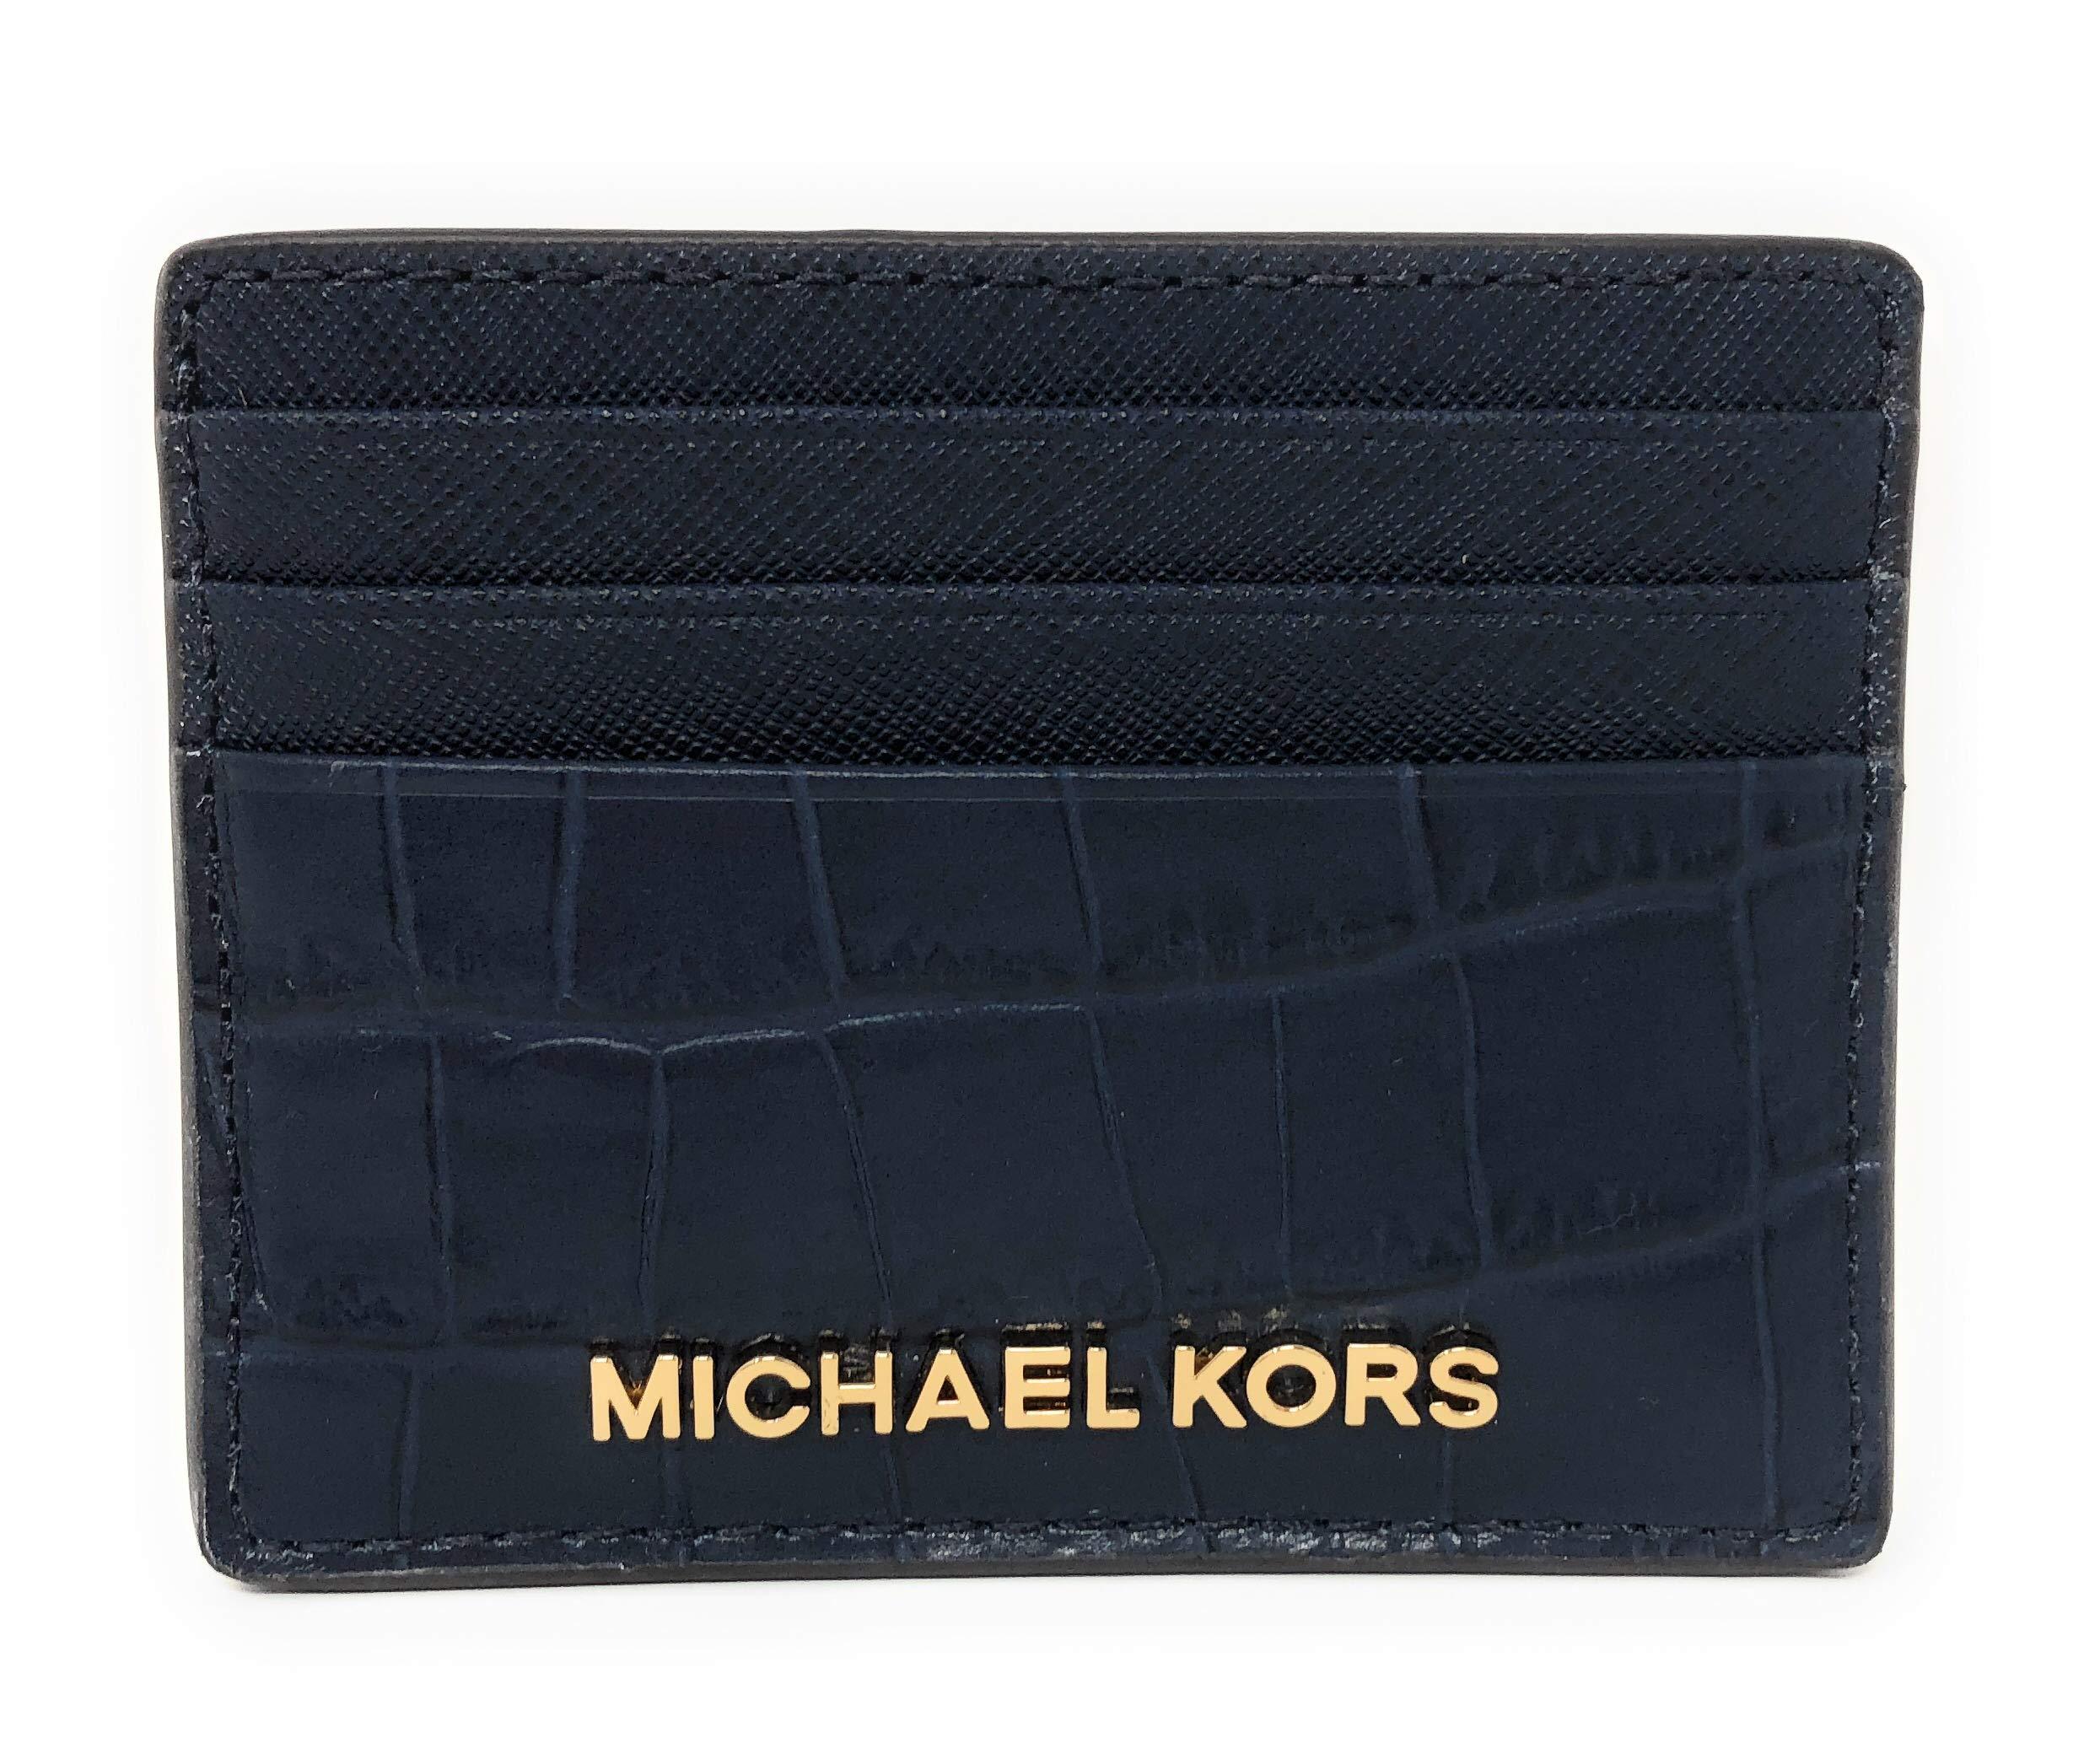 Michael Kors Jet Set Travel Credit Card Holder Case Embossed Leather (Navy) by Michael Kors